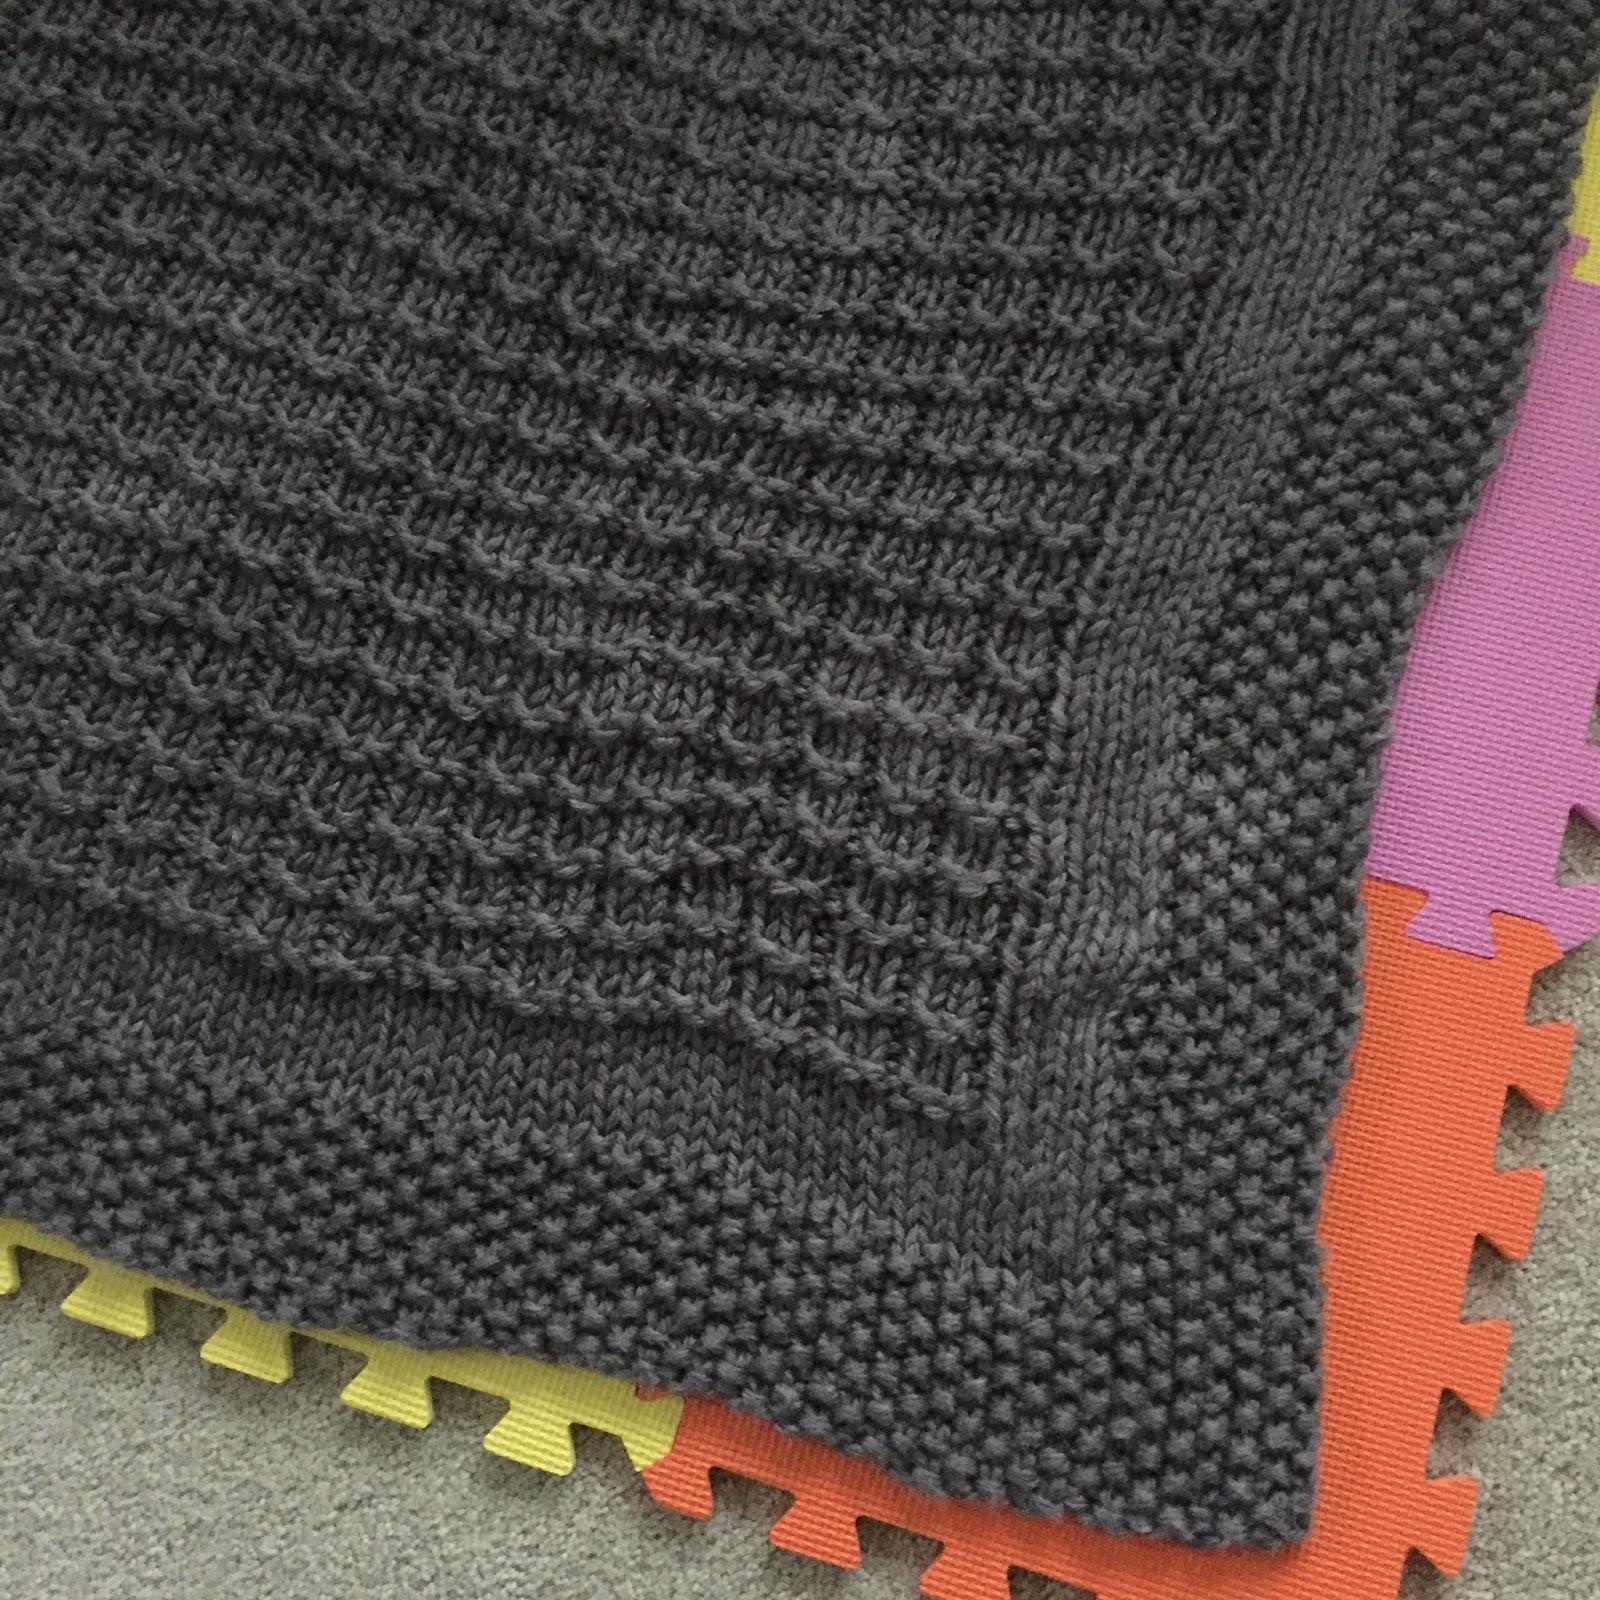 Knitting Edges Uneven : Fifty four ten studio new chunky blanket knitting pattern